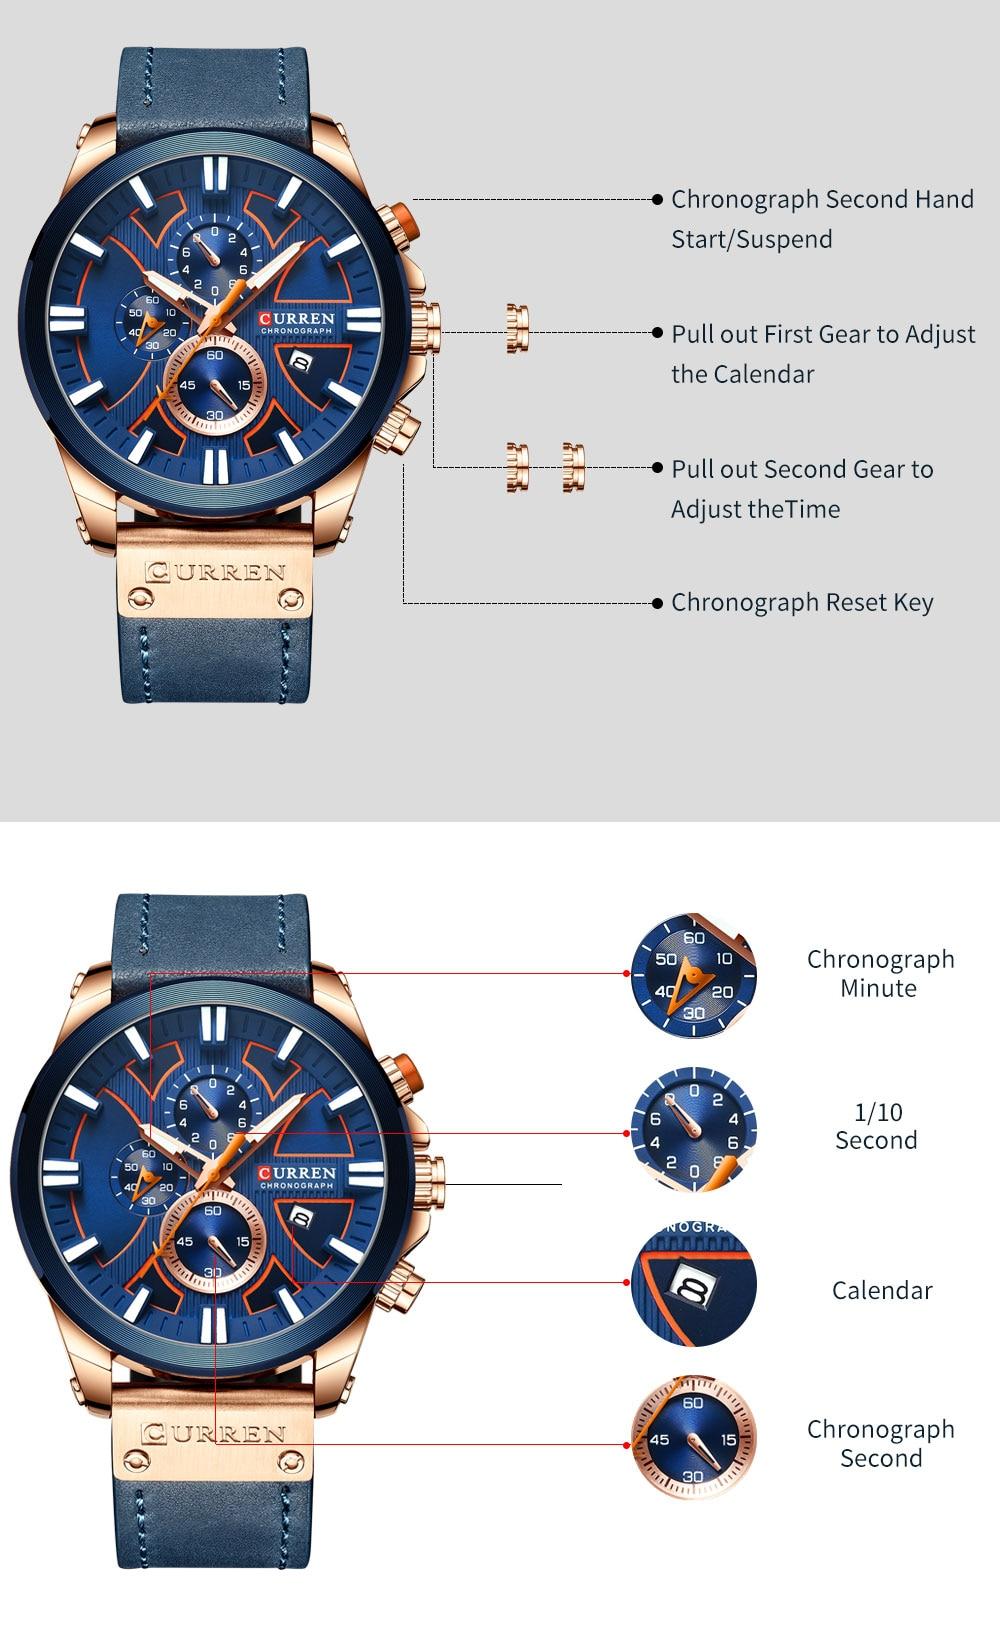 Hc832bb3f78284f8ab33b4cd8aafa8c5ec New CURREN Men Watches Fashion Quartz Wrist Watches Men's Military Waterproof Sports Watch Male Date Clock Relogio Masculino